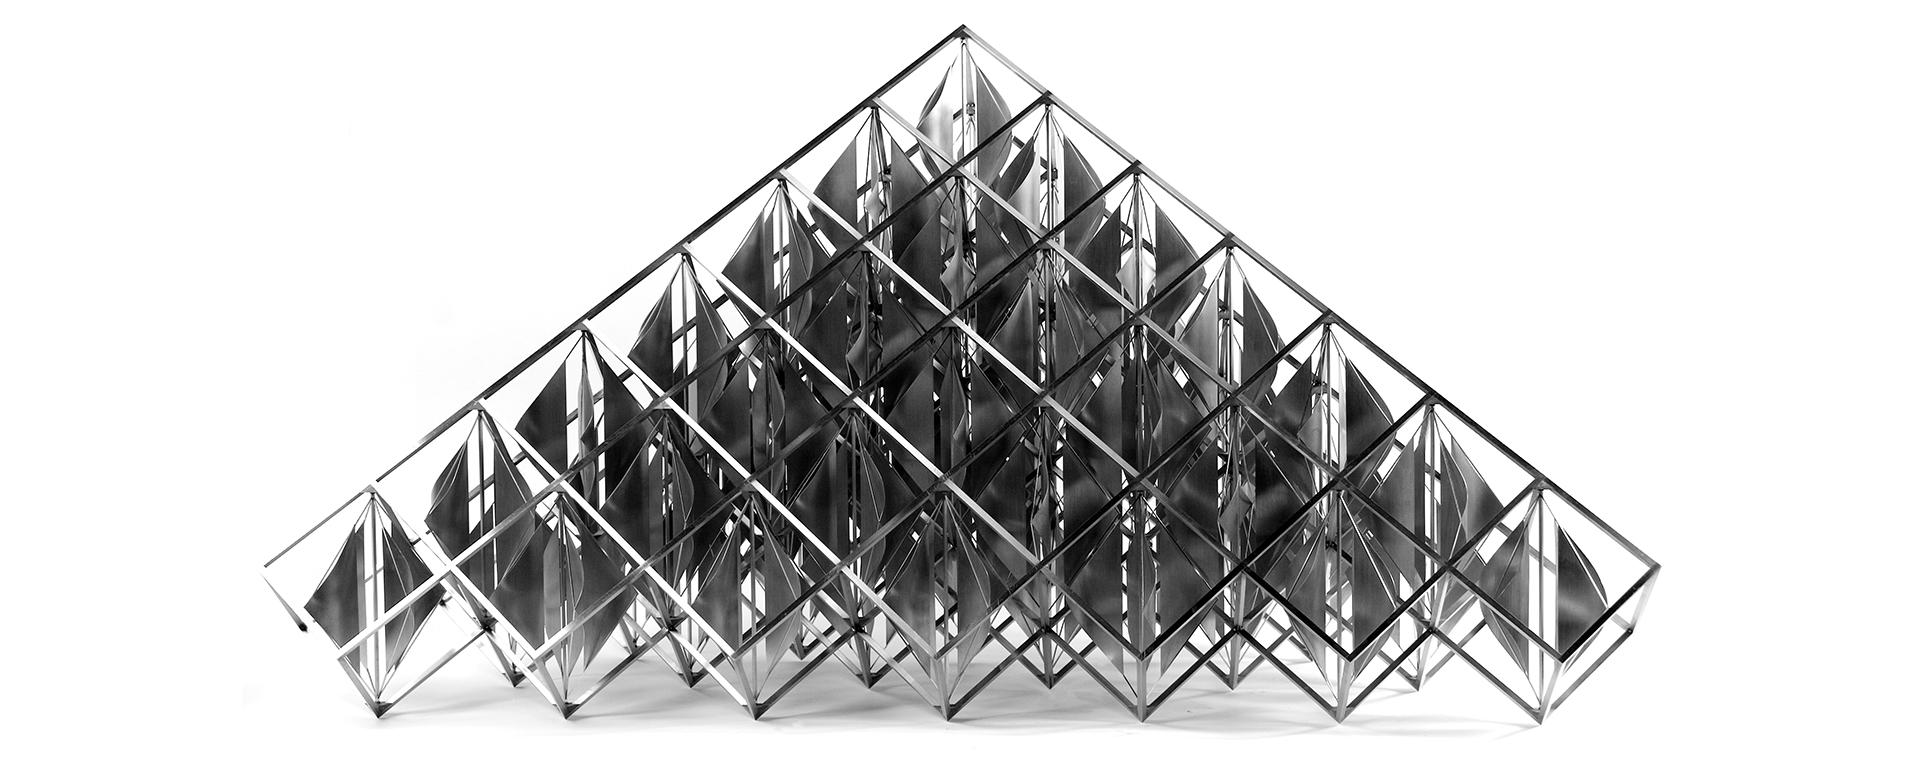 Alejandro Otero (Venezuela, 1921–1990)  Delta solar , 1979,Stainless steel and aluminum. Gift of Beatriz & Manuel Kohn